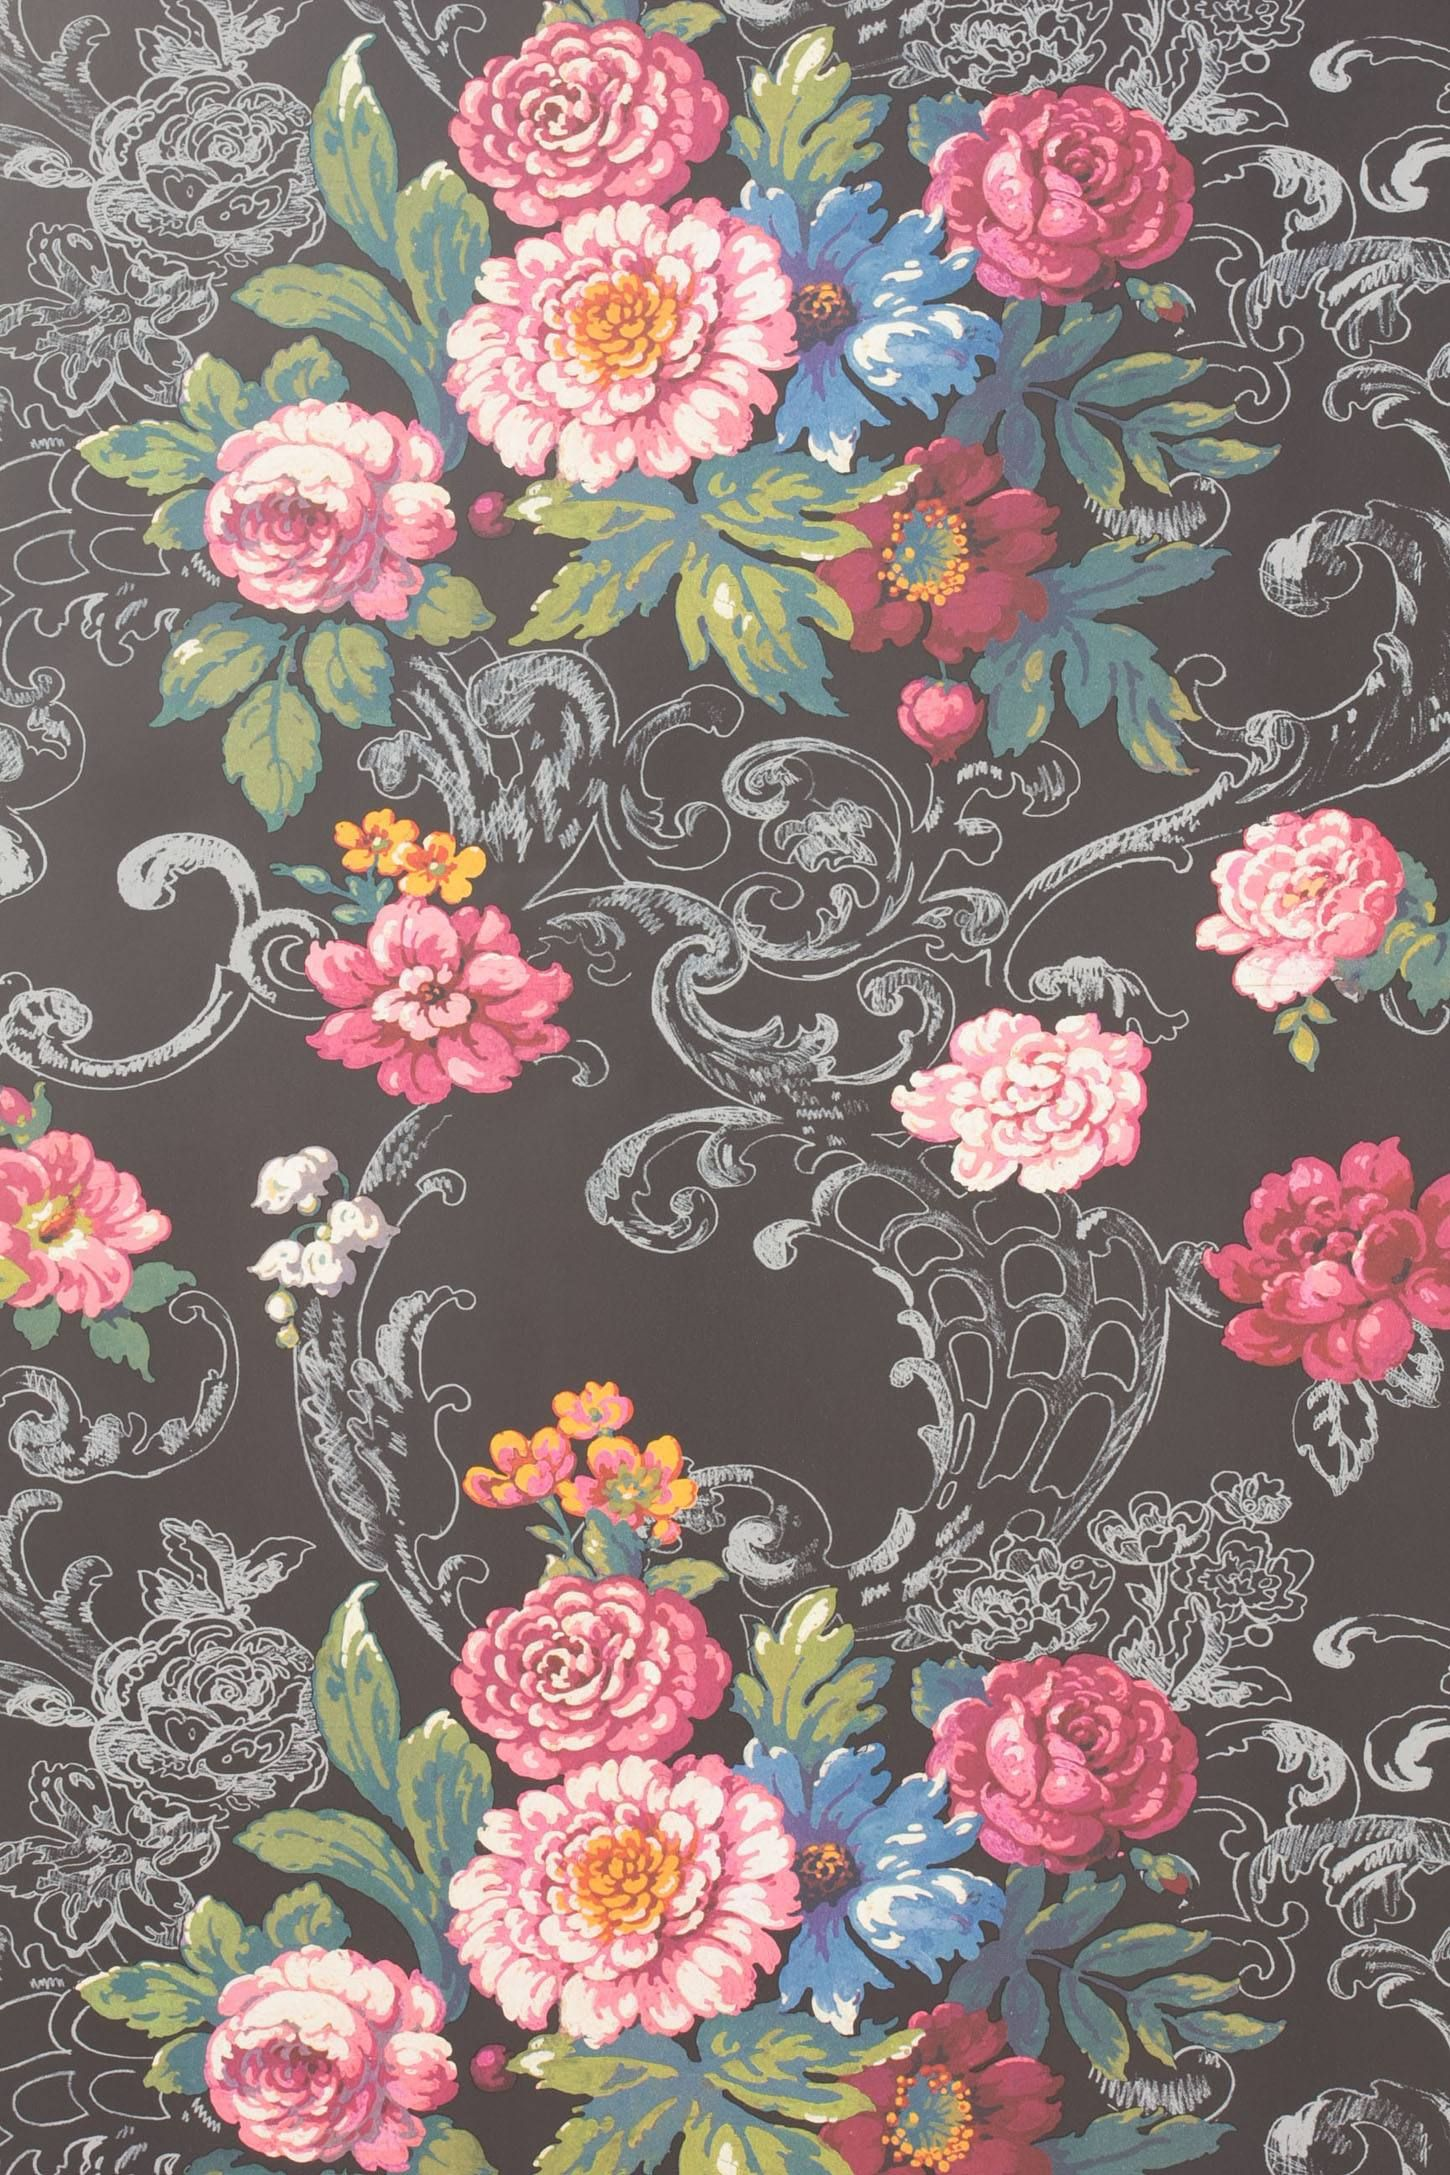 Bouquet Wallpaper anthropologie.eu Vintage